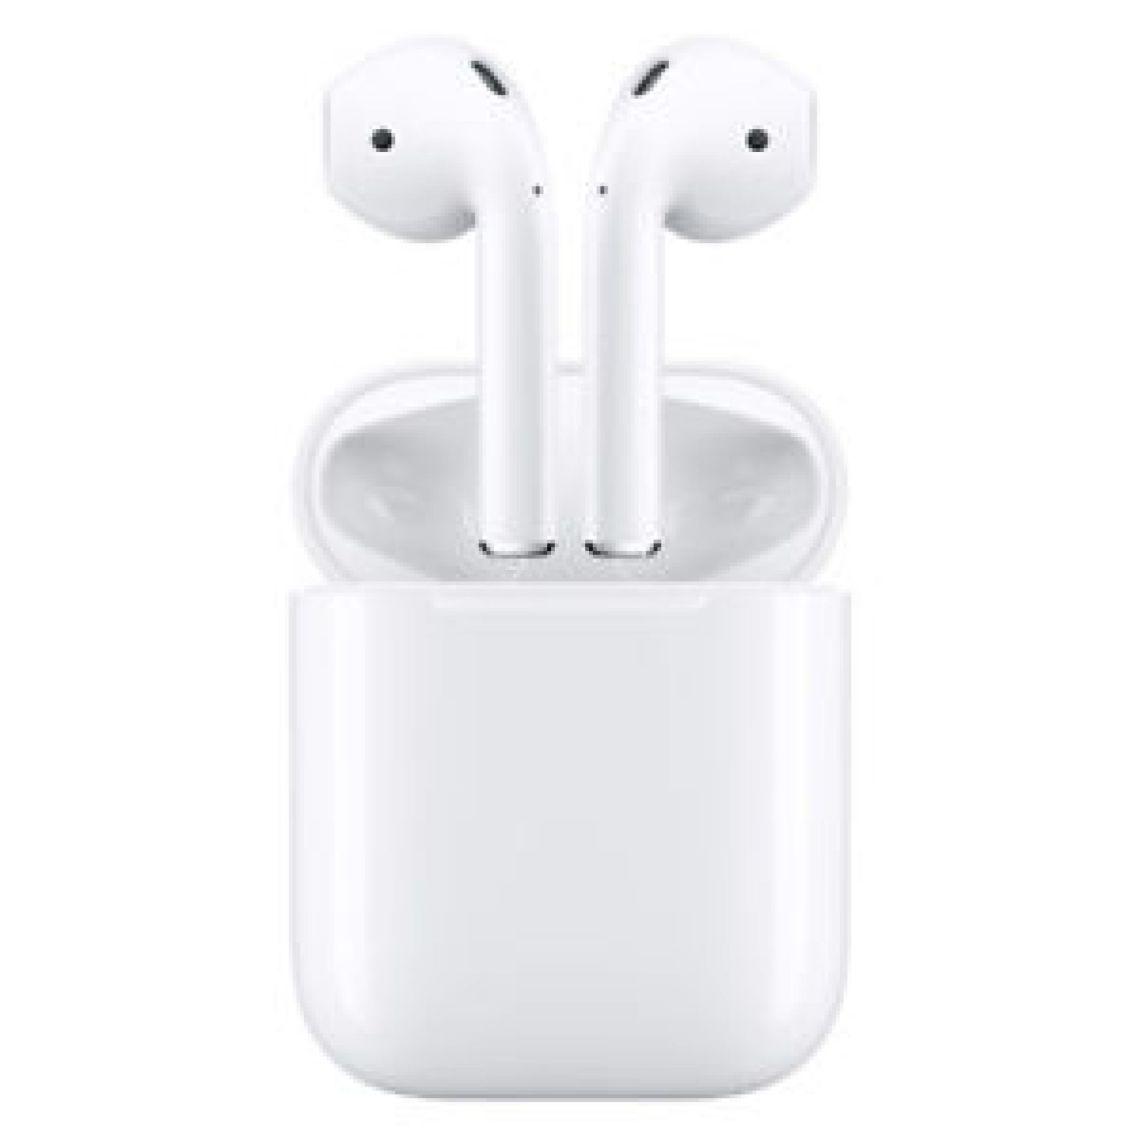 Apple AirPods Wireless Bluetooth Earphones Headphones - White 888462858410 | eBay